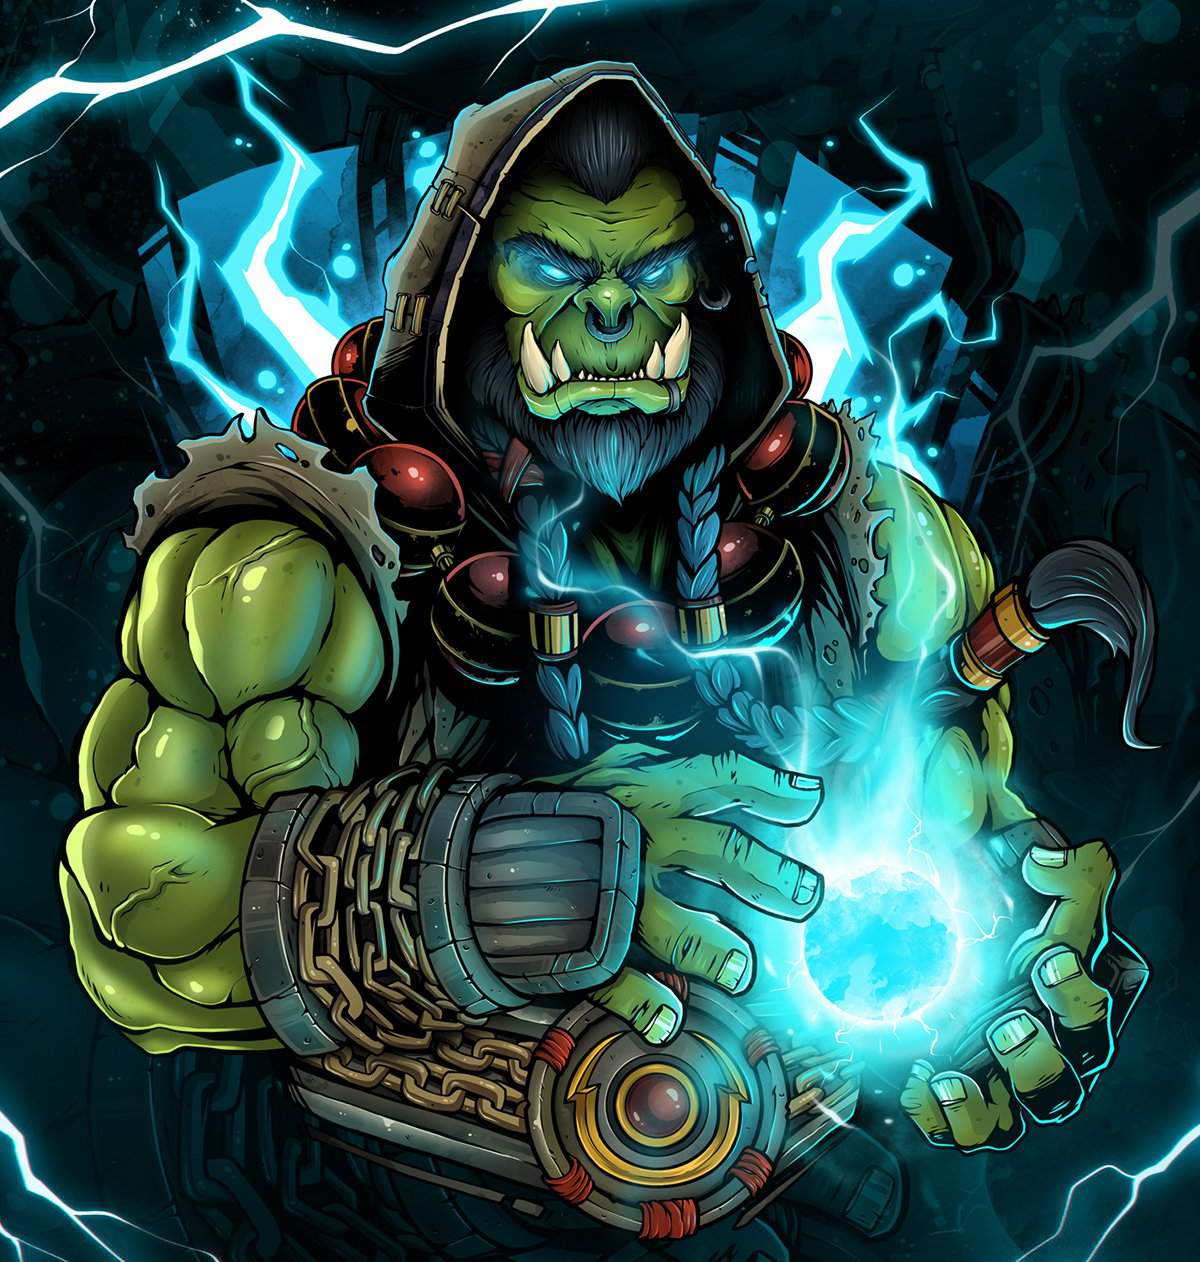 Тралл warcraft – Тралл — История World of Warcraft, Hearthstone и ... | 1262x1200